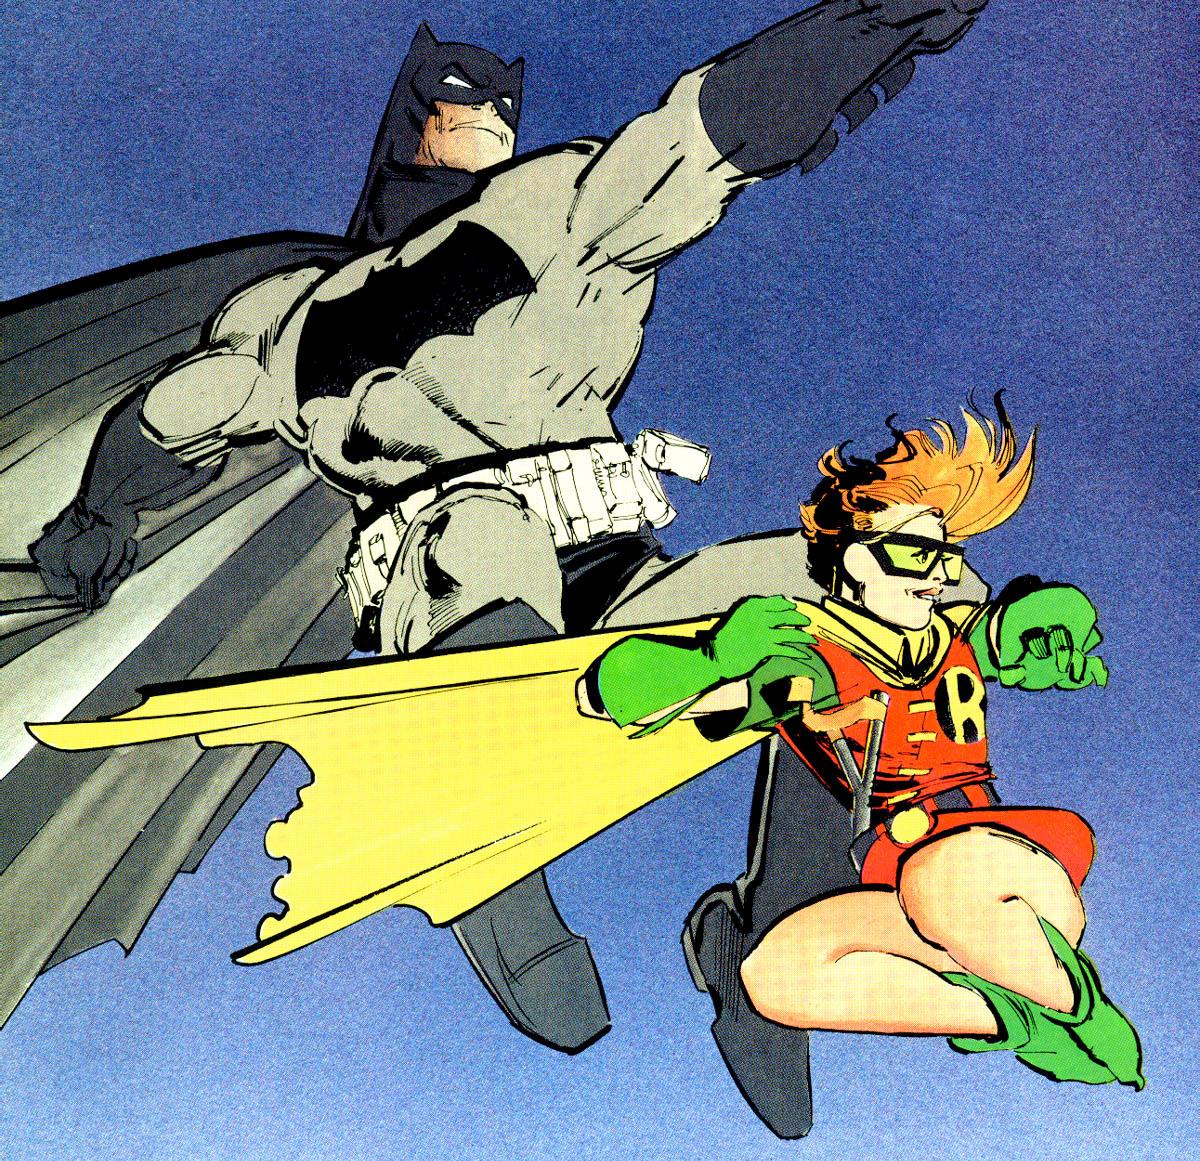 http://data.techtimes.com/data/images/full/27993/batman-robin-dark-knight-returns-jpg.jpg